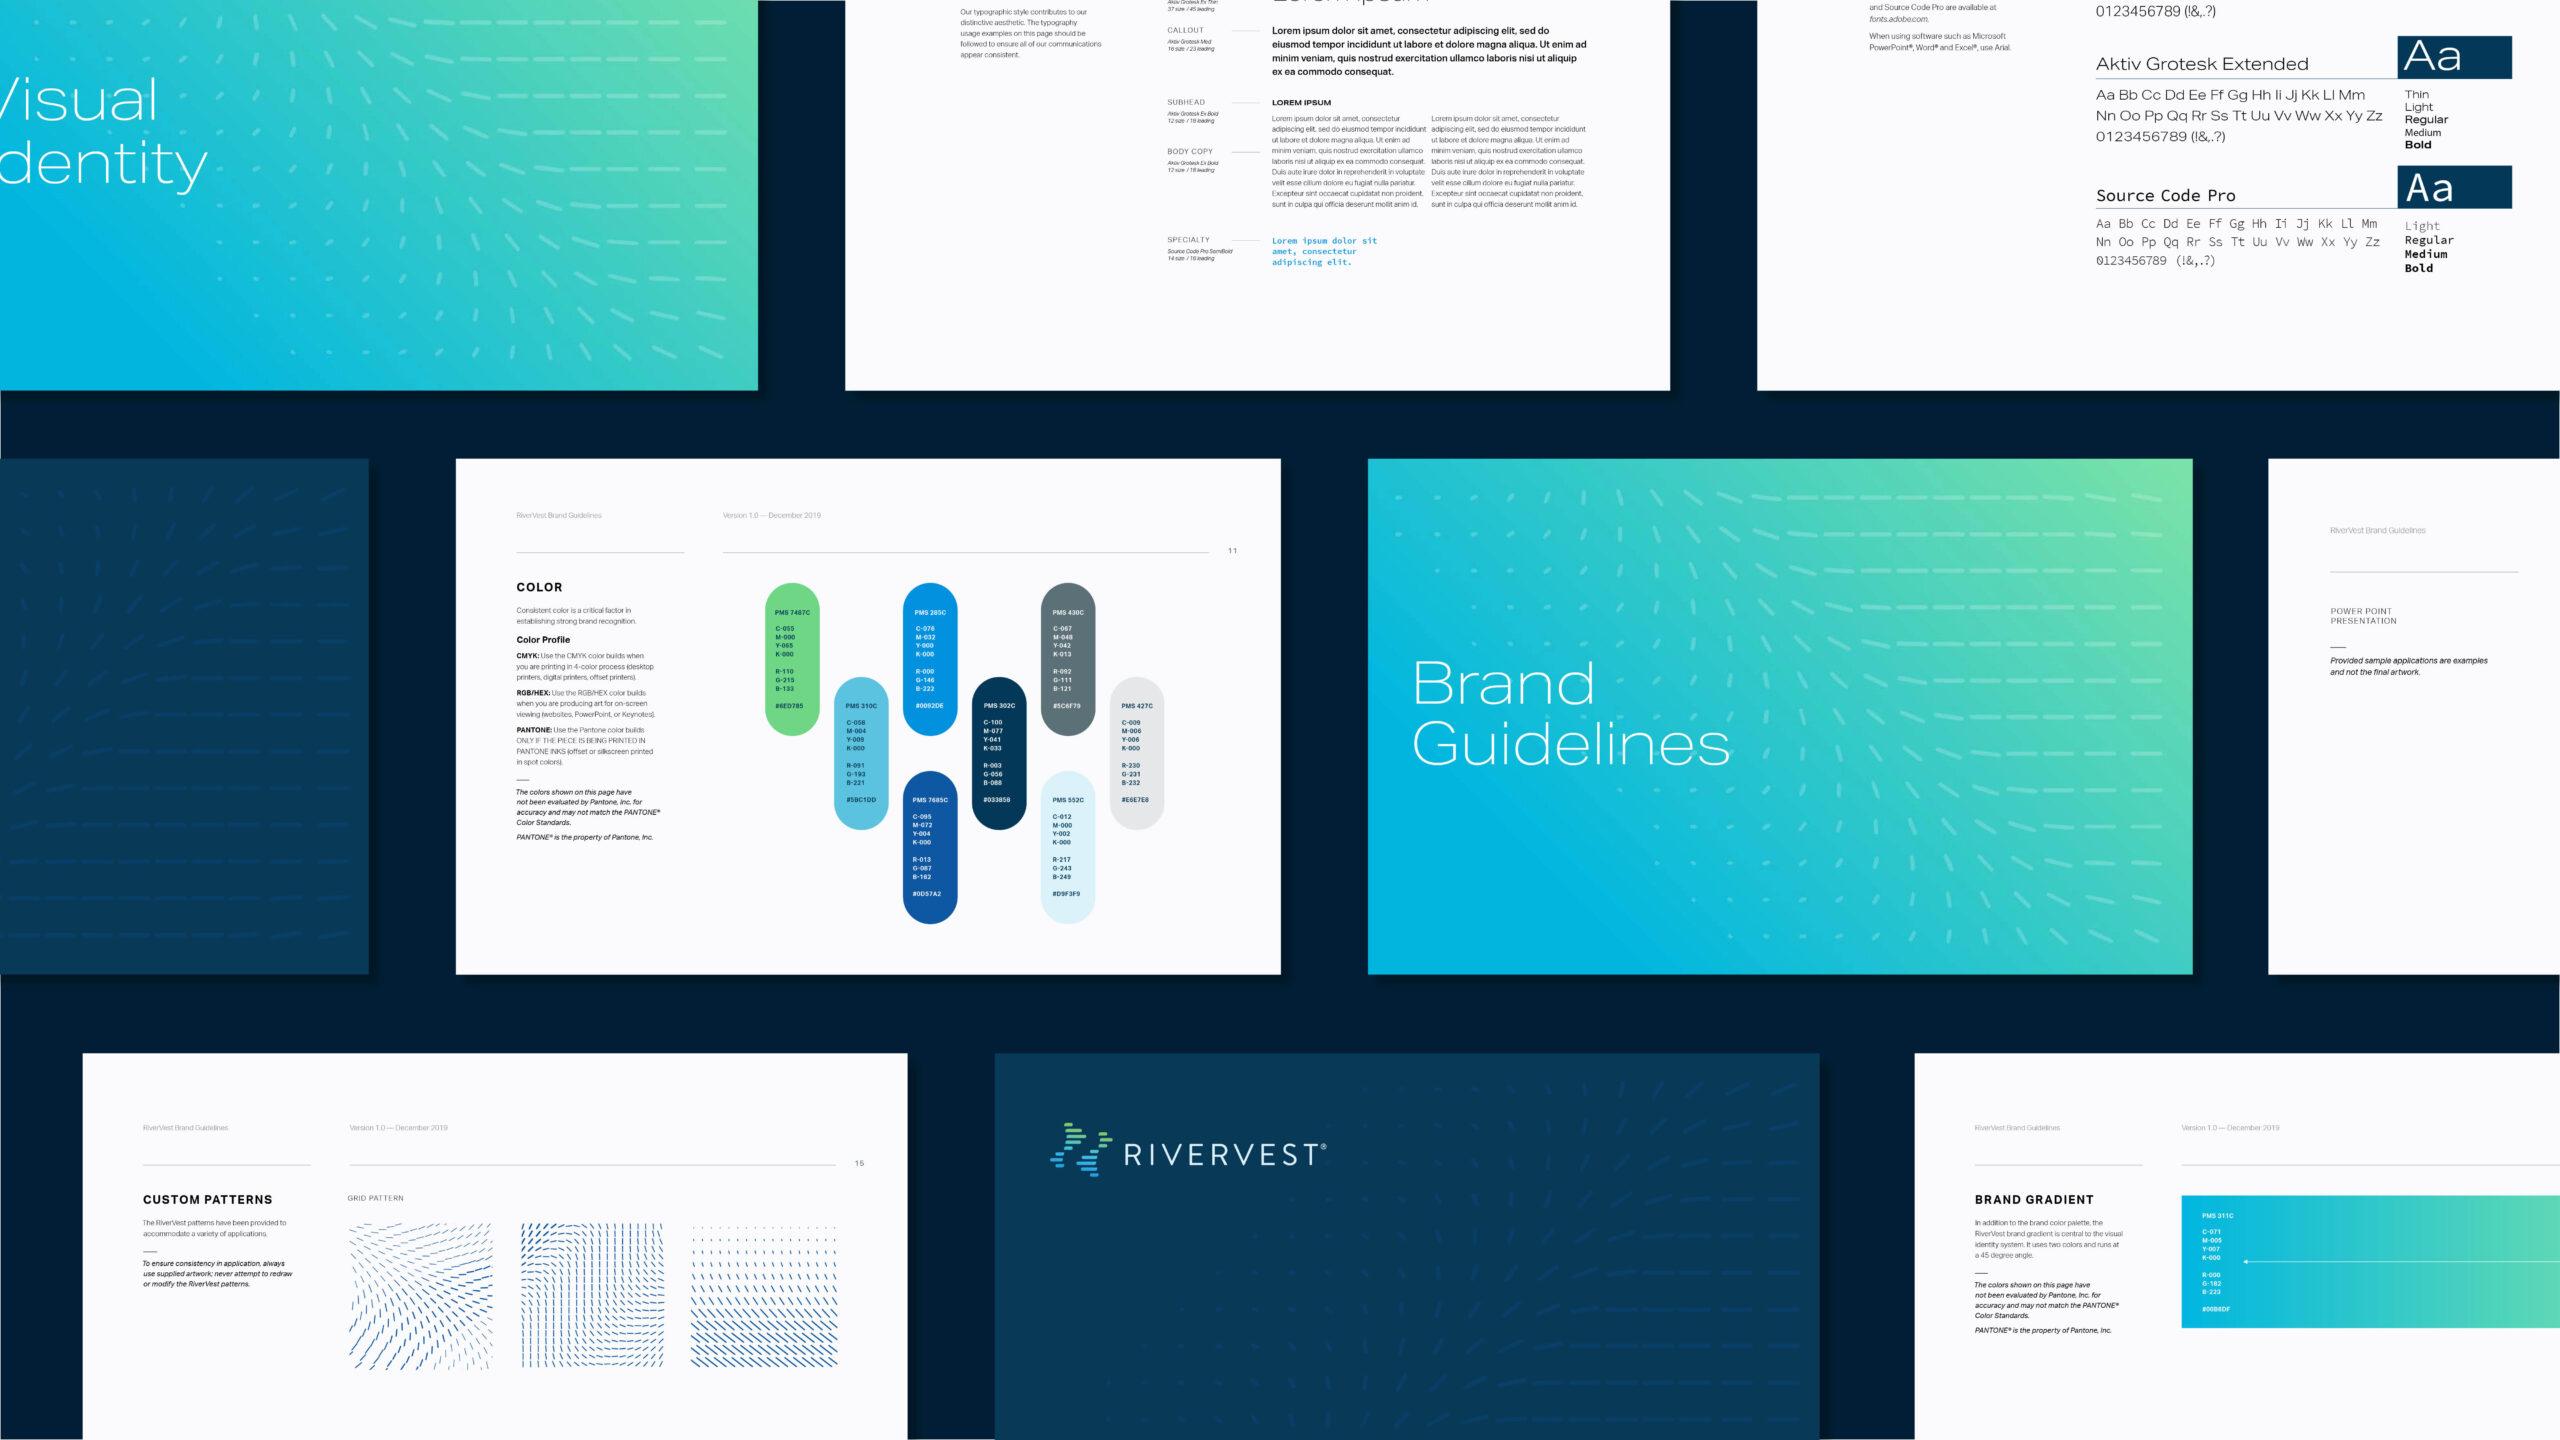 Mockup of RiverVest brand materials